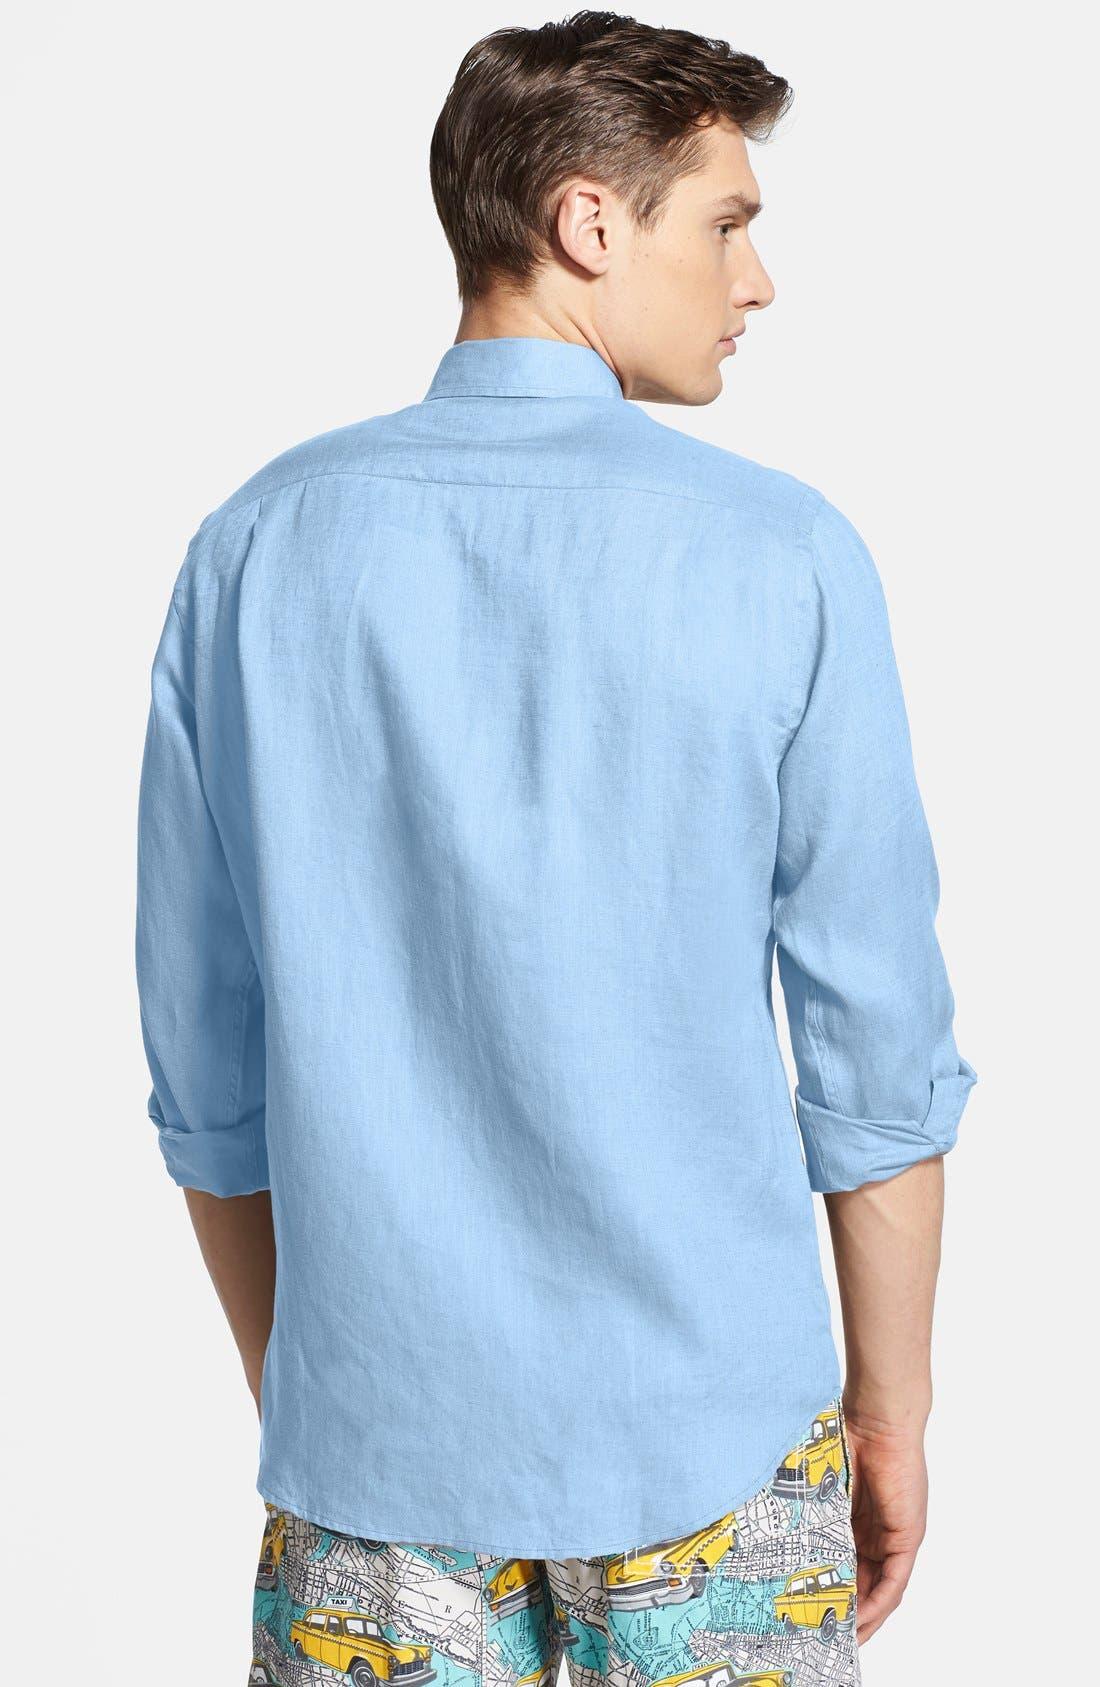 'Caroubier' Linen Shirt,                             Alternate thumbnail 2, color,                             Sky Blue